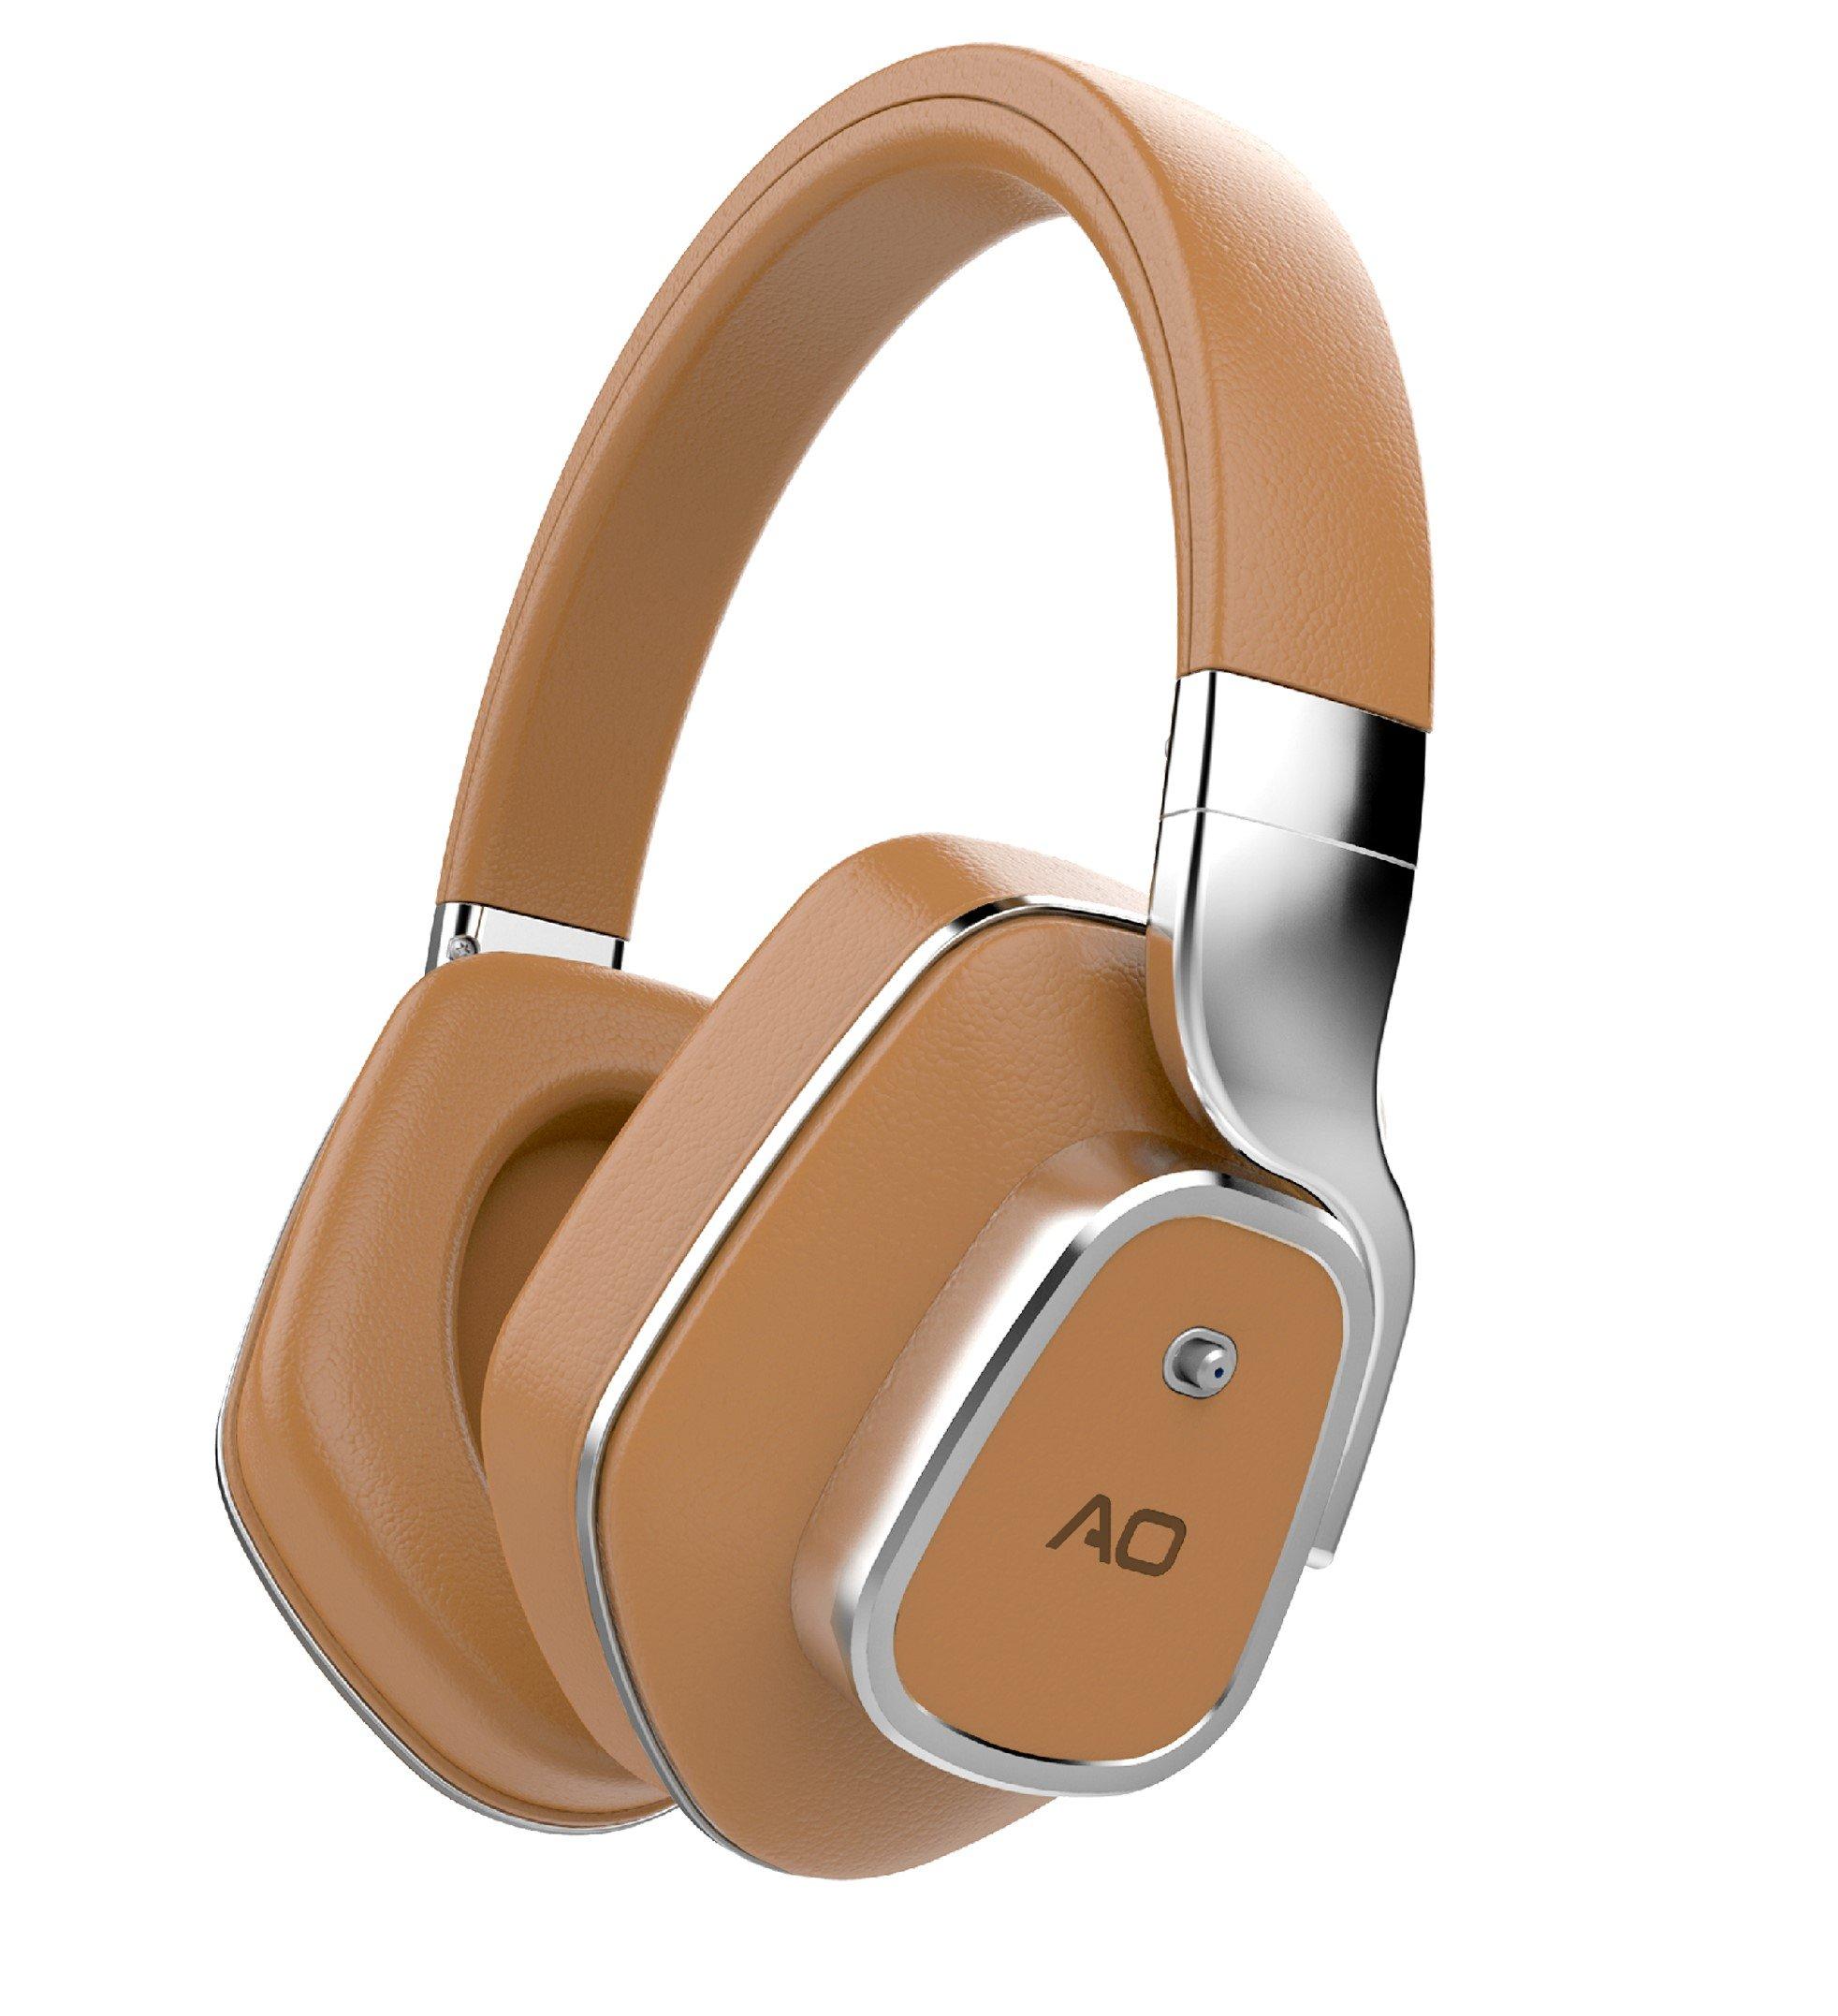 Auriculares AO Cancelacion de Ruido Activa Inalambrico Bluetooth - M7 (Brown)